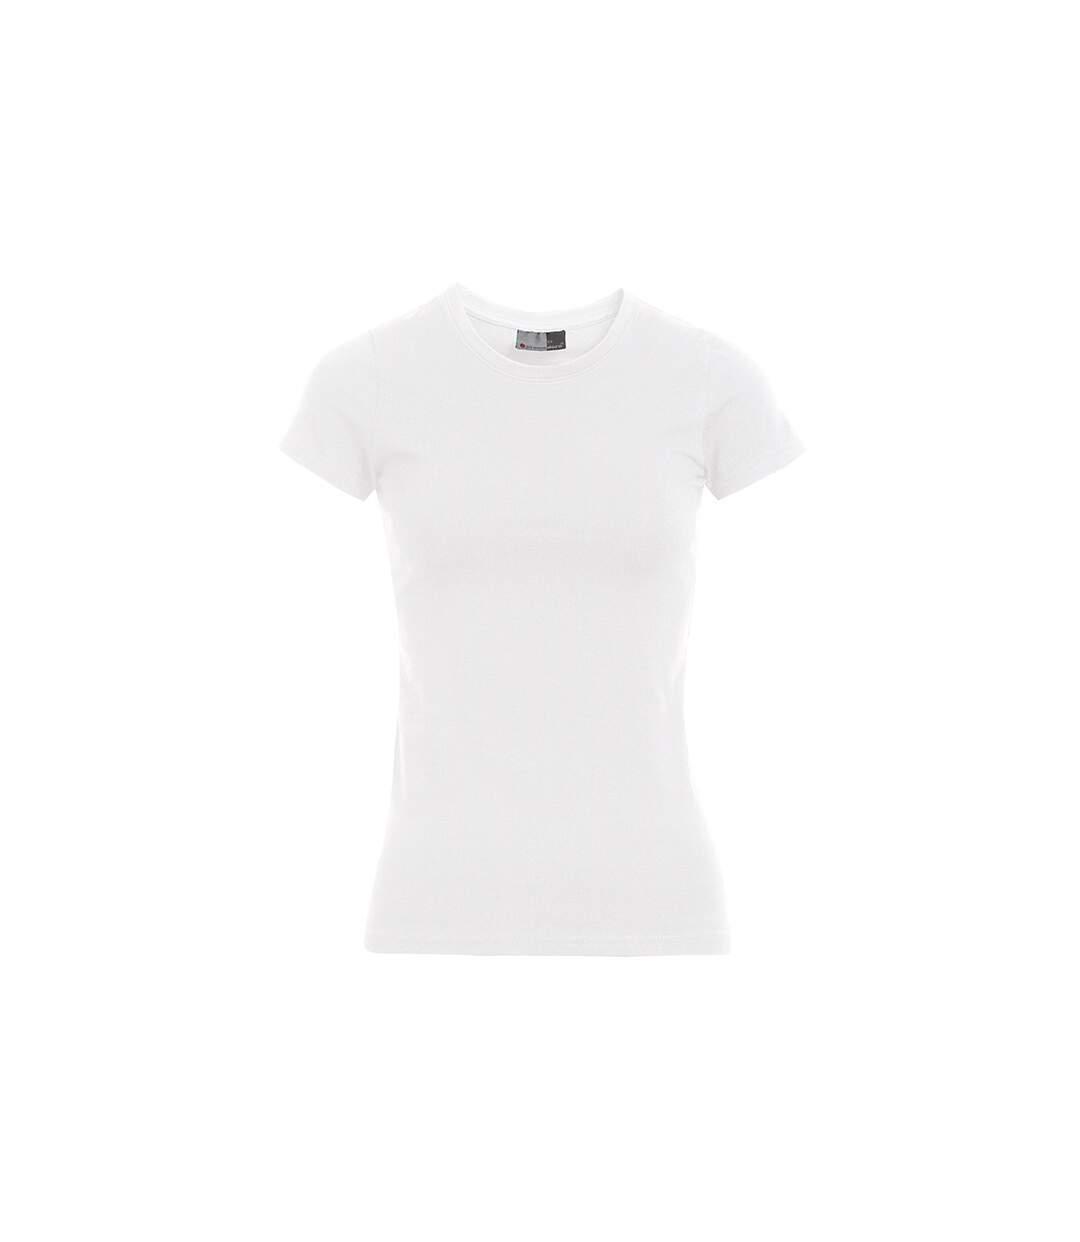 T-shirt slim grandes tailles Femmes